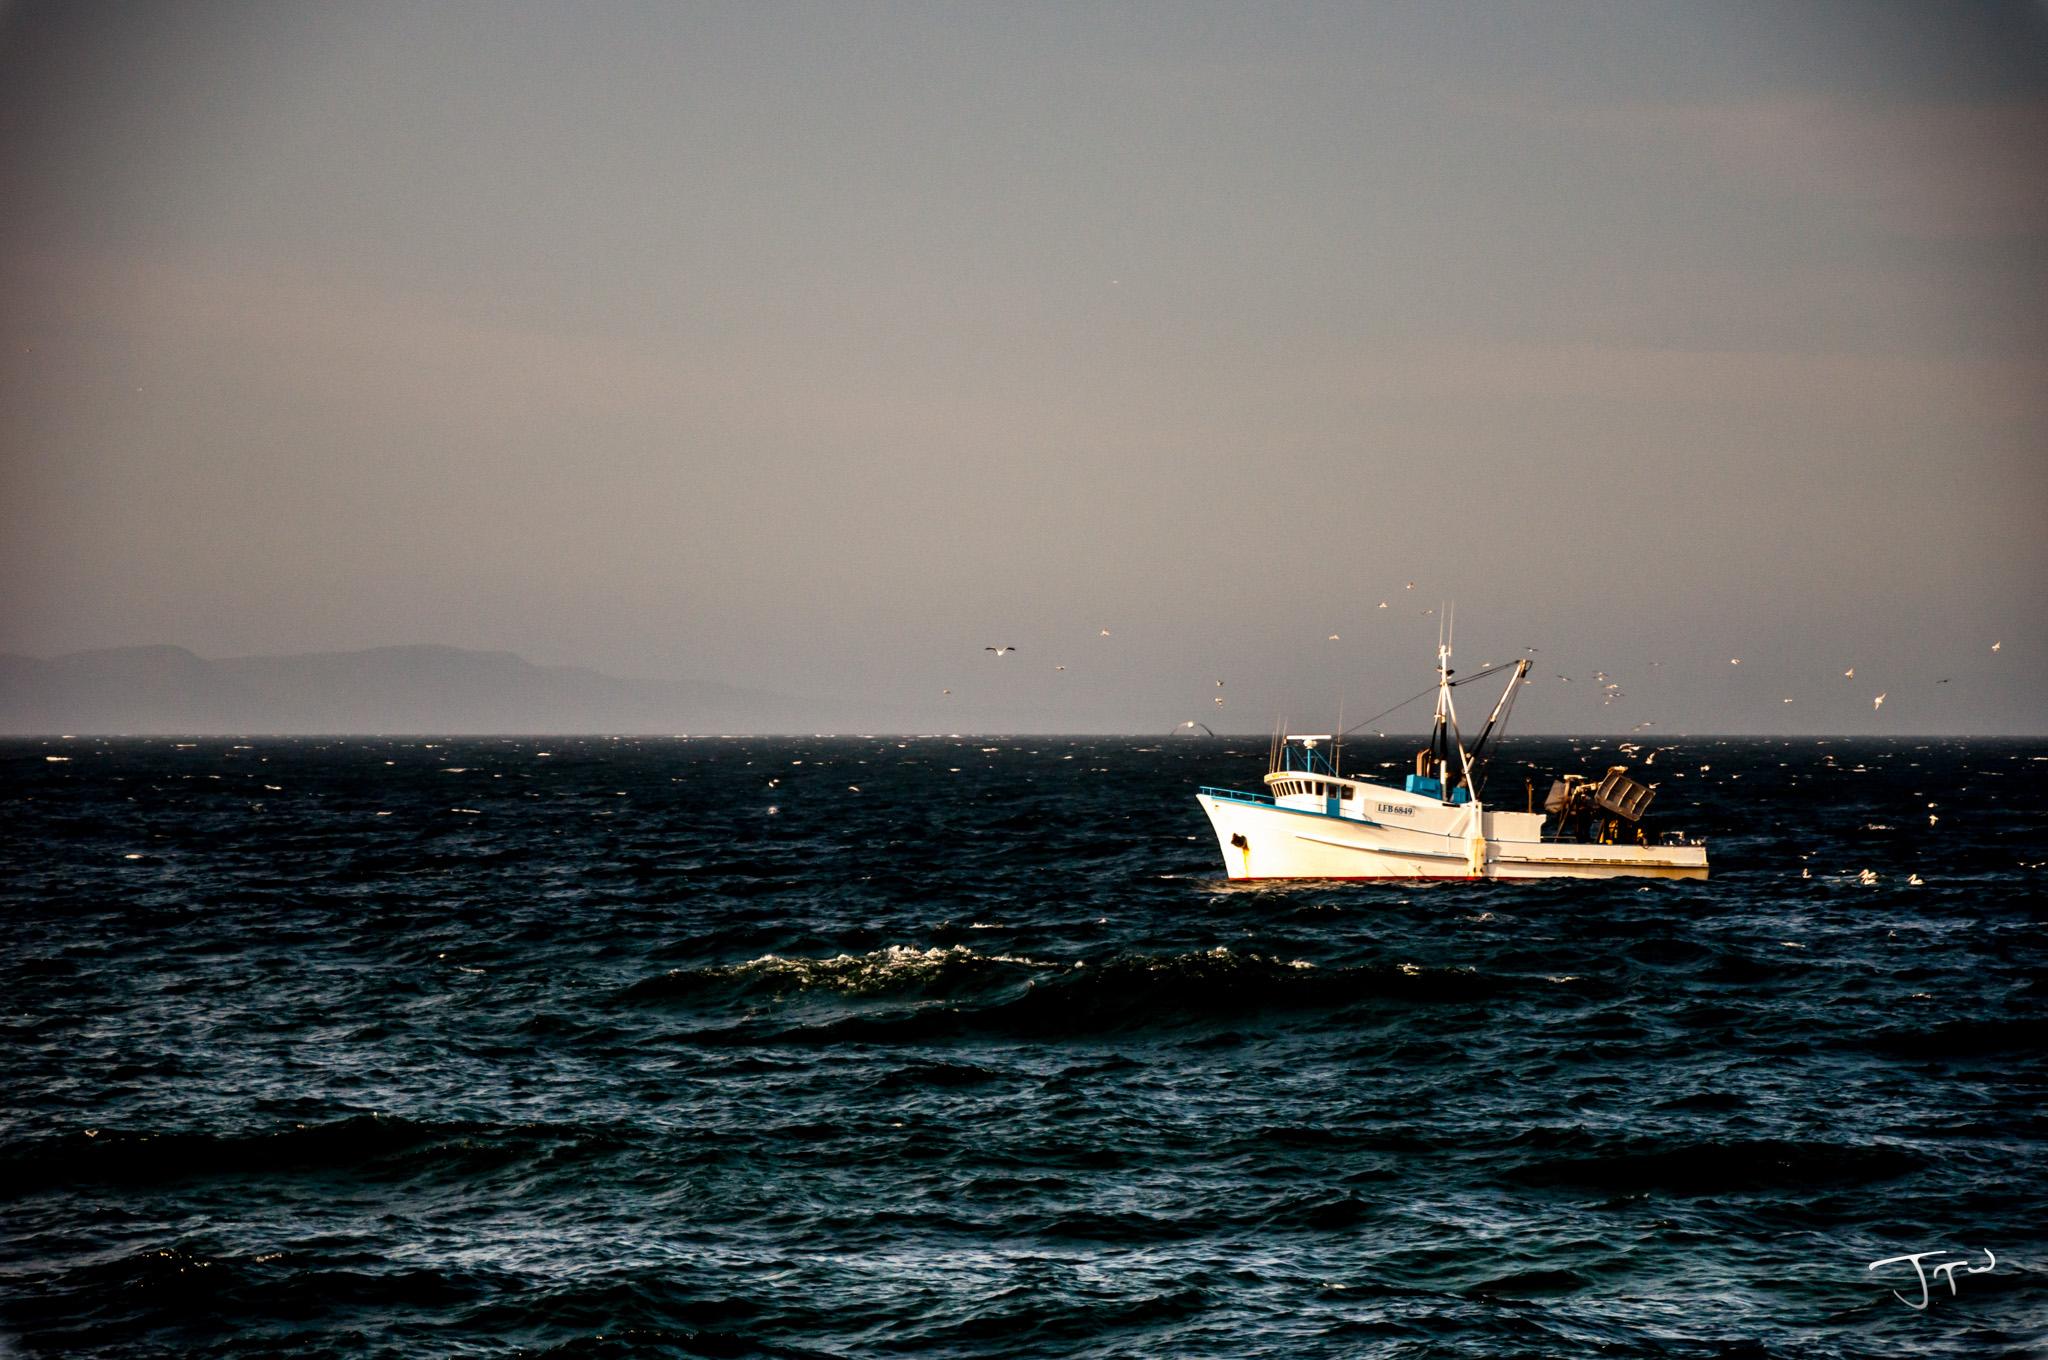 Wollongong Fishing Boat